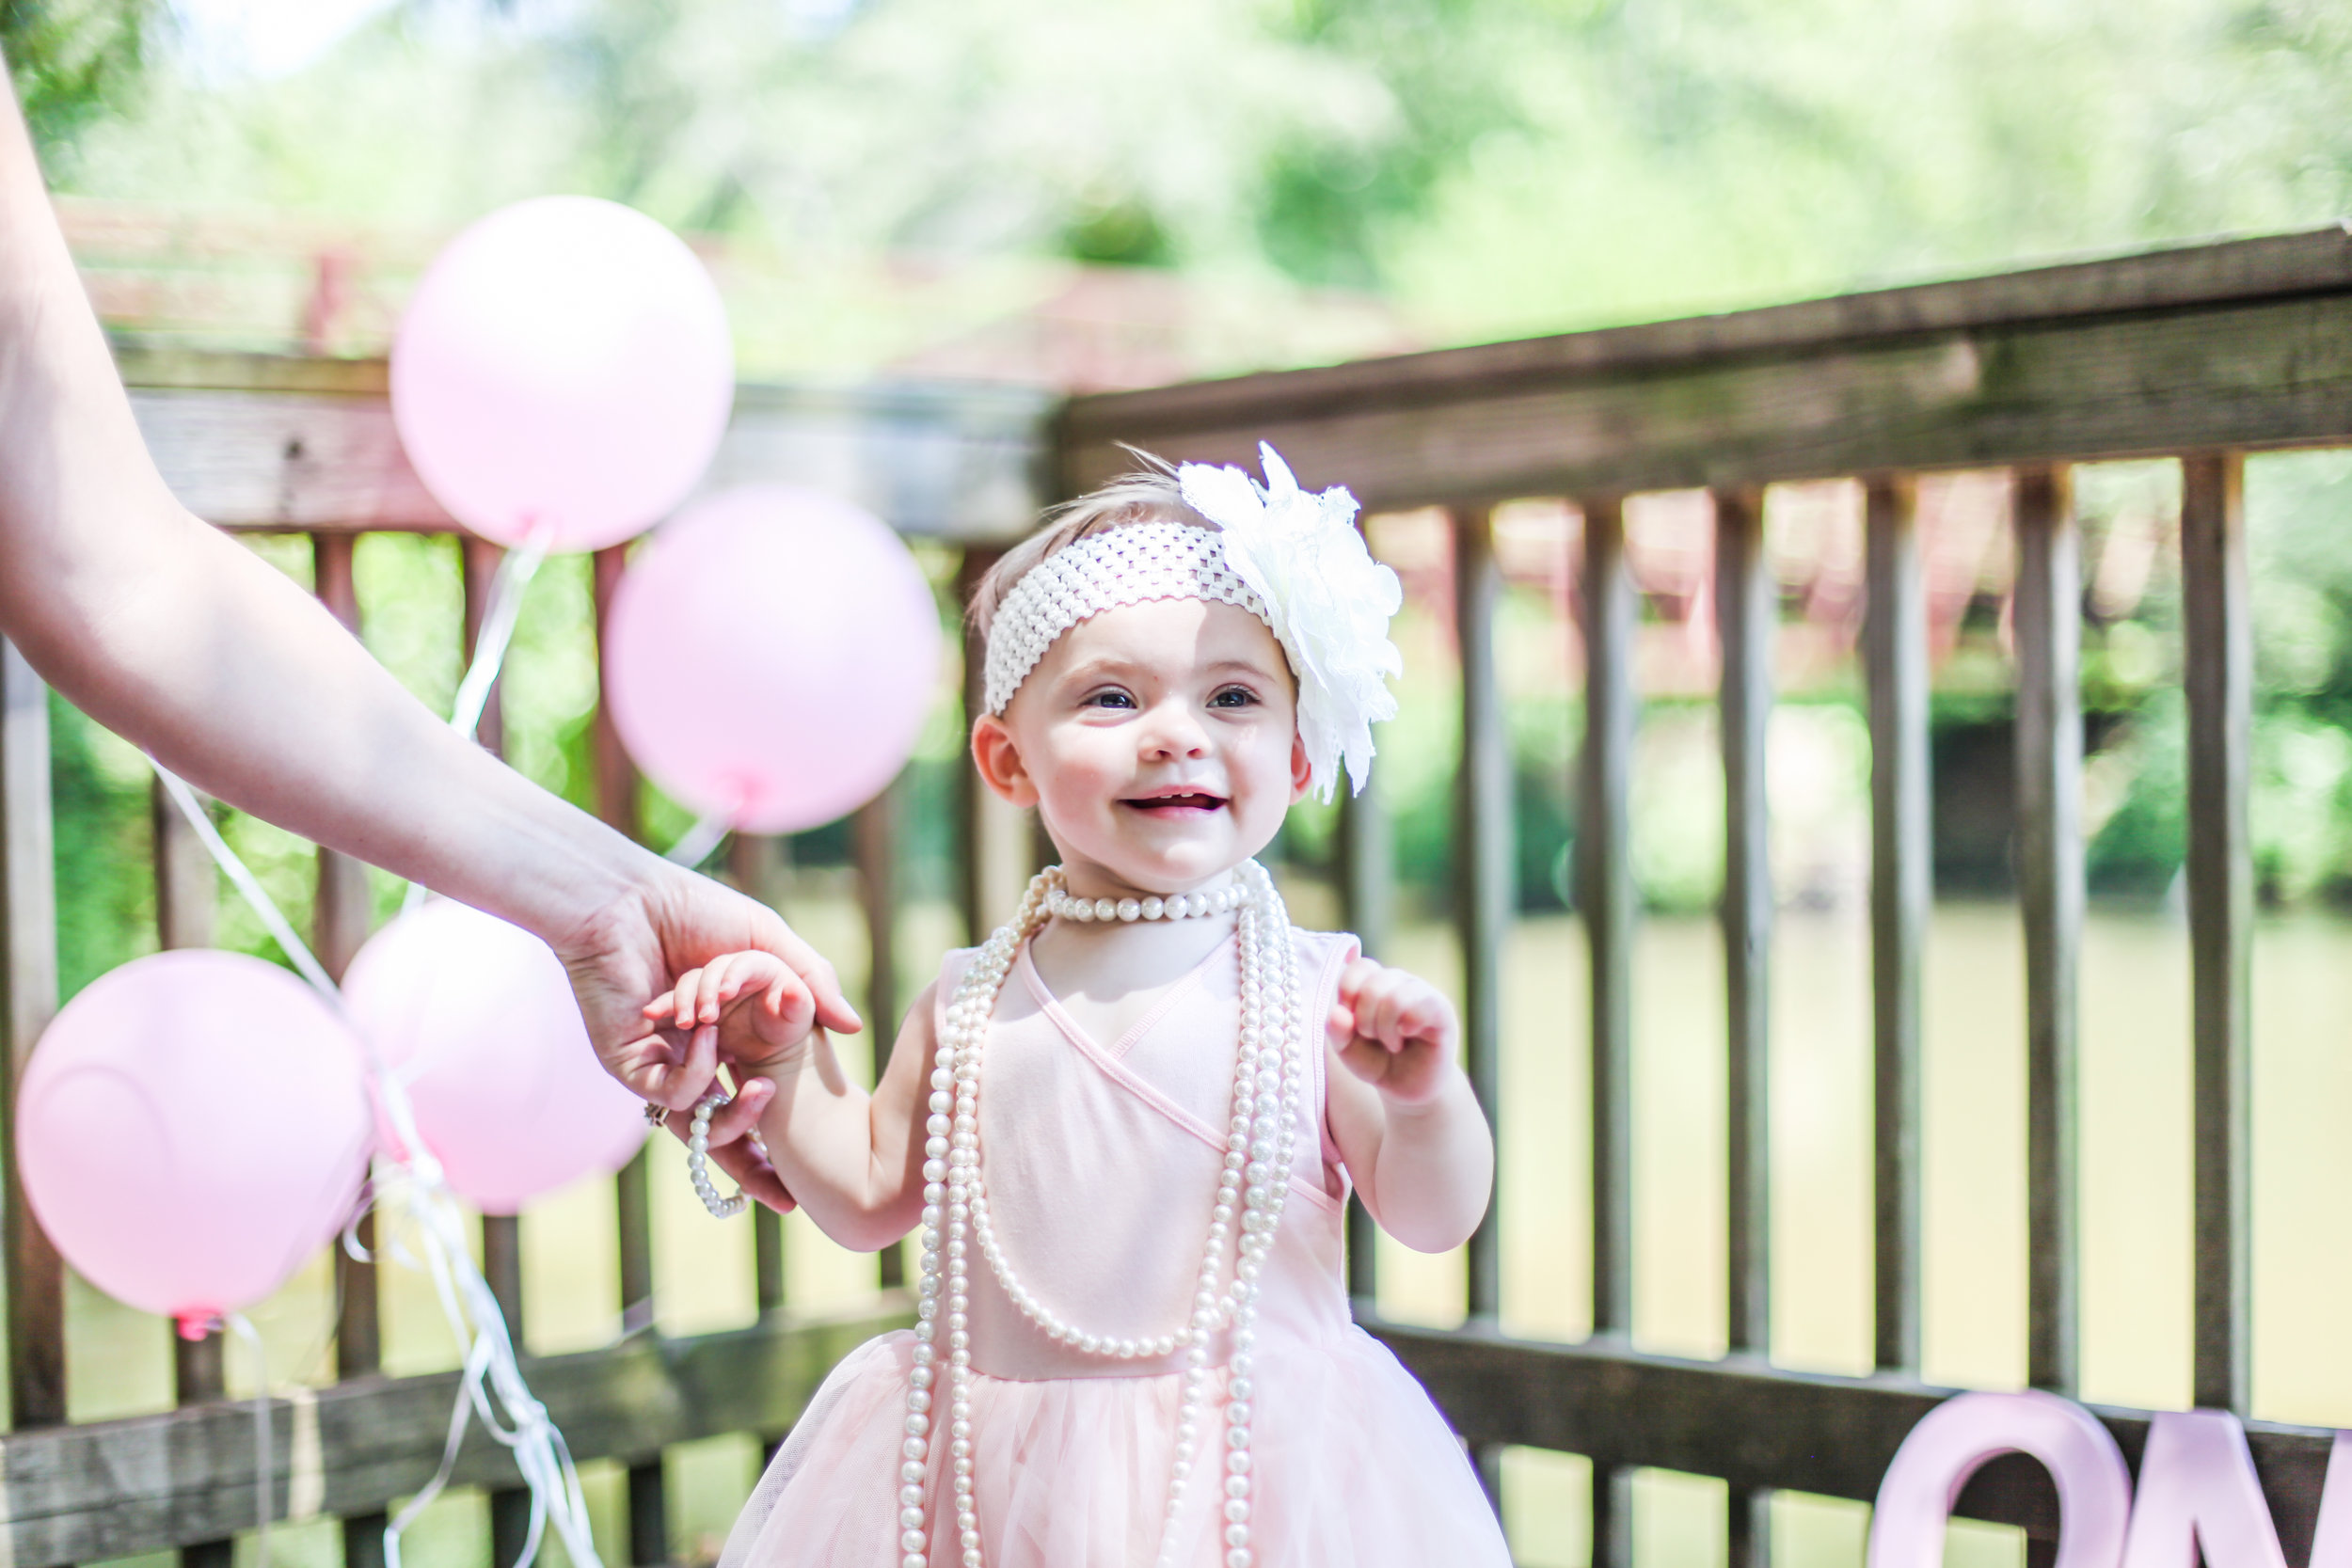 woodstock baby photography angela elliott-52.jpg